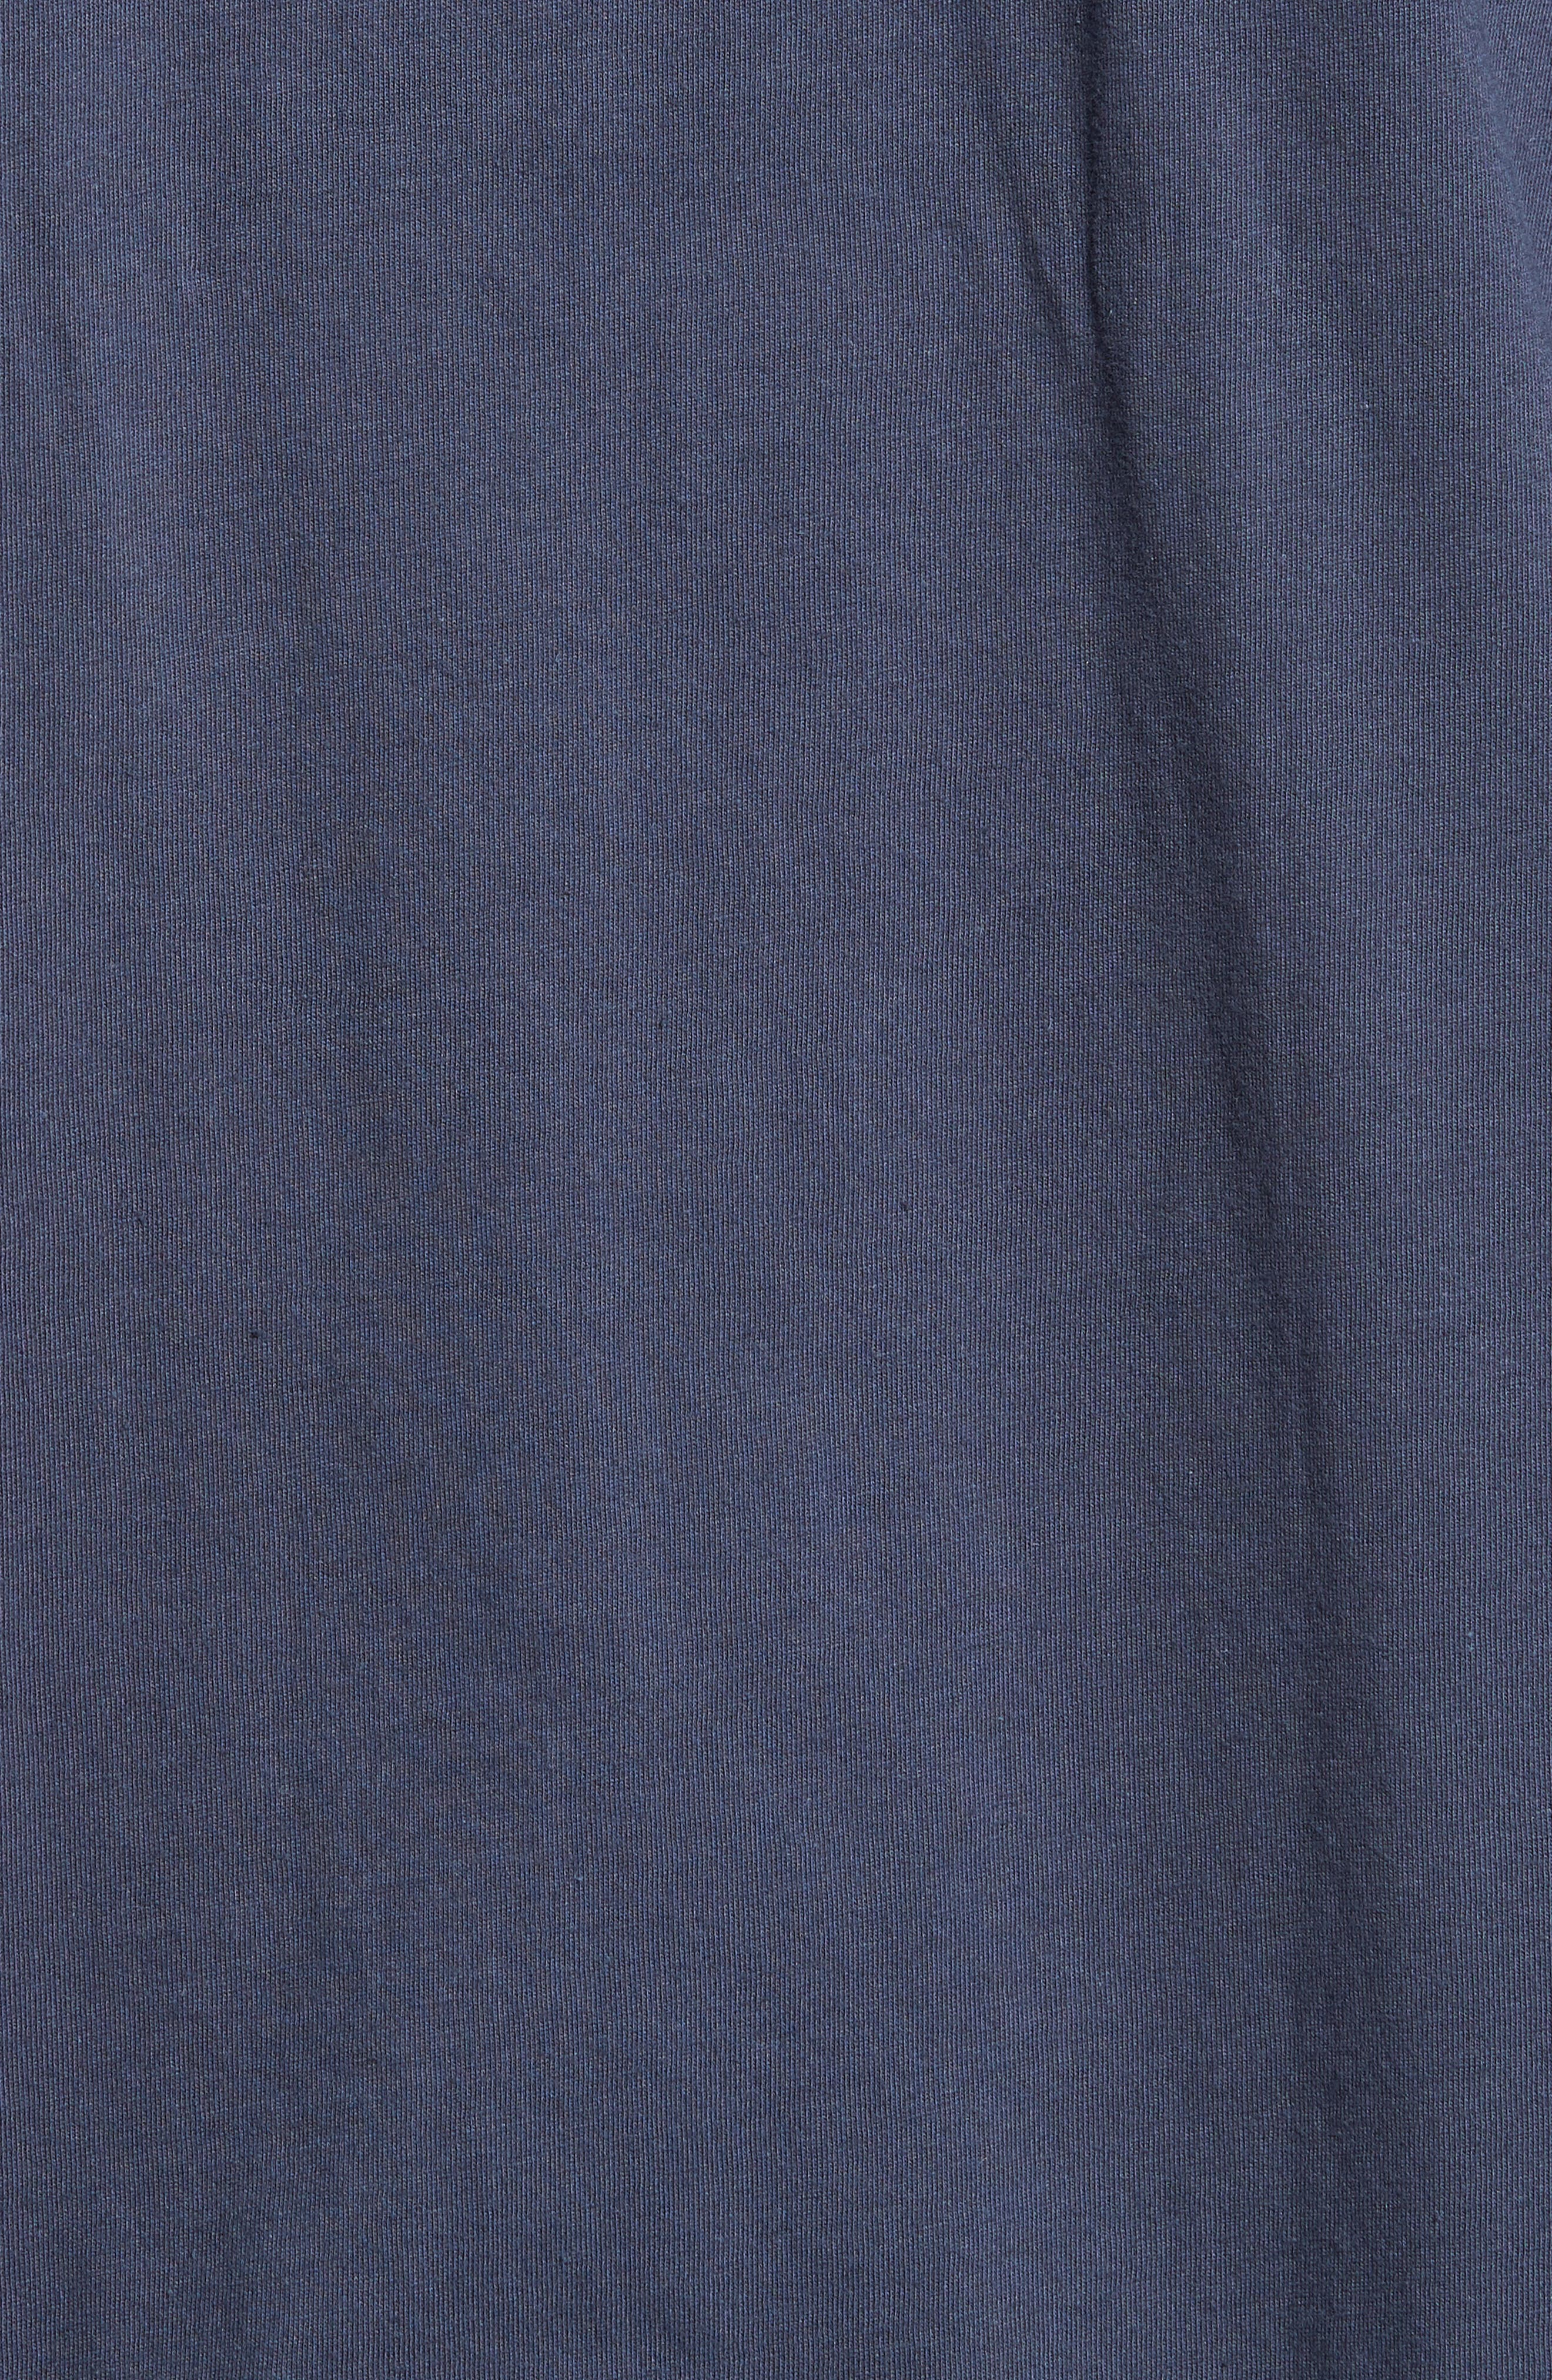 Disco T-Shirt,                             Alternate thumbnail 5, color,                             Slate